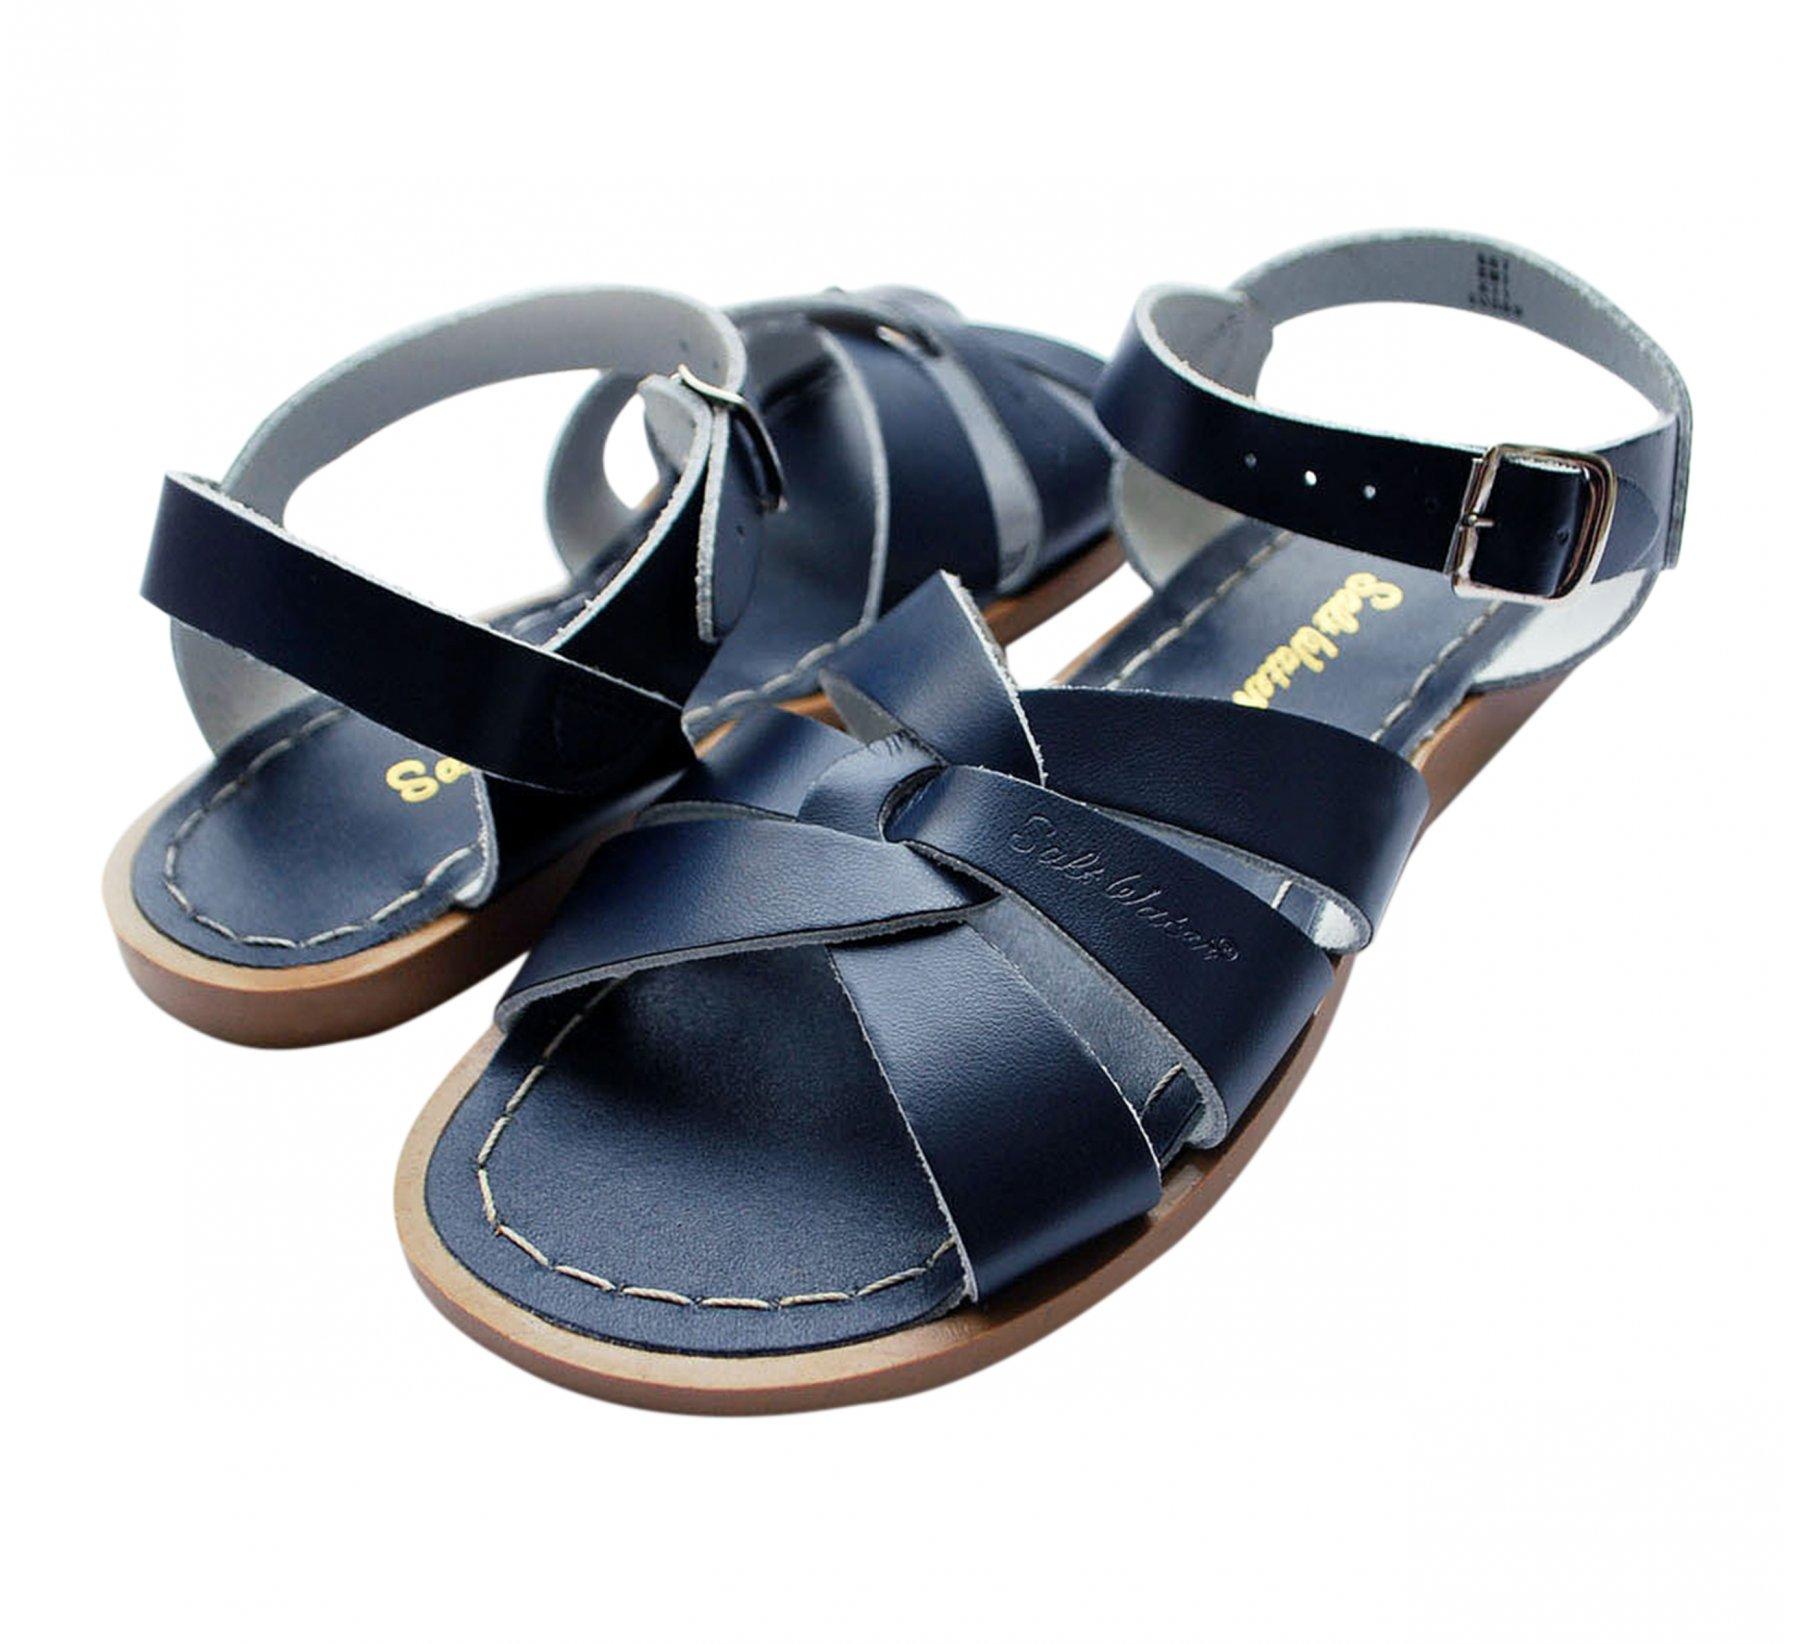 Original Navy Sandal - Salt Water Sandals